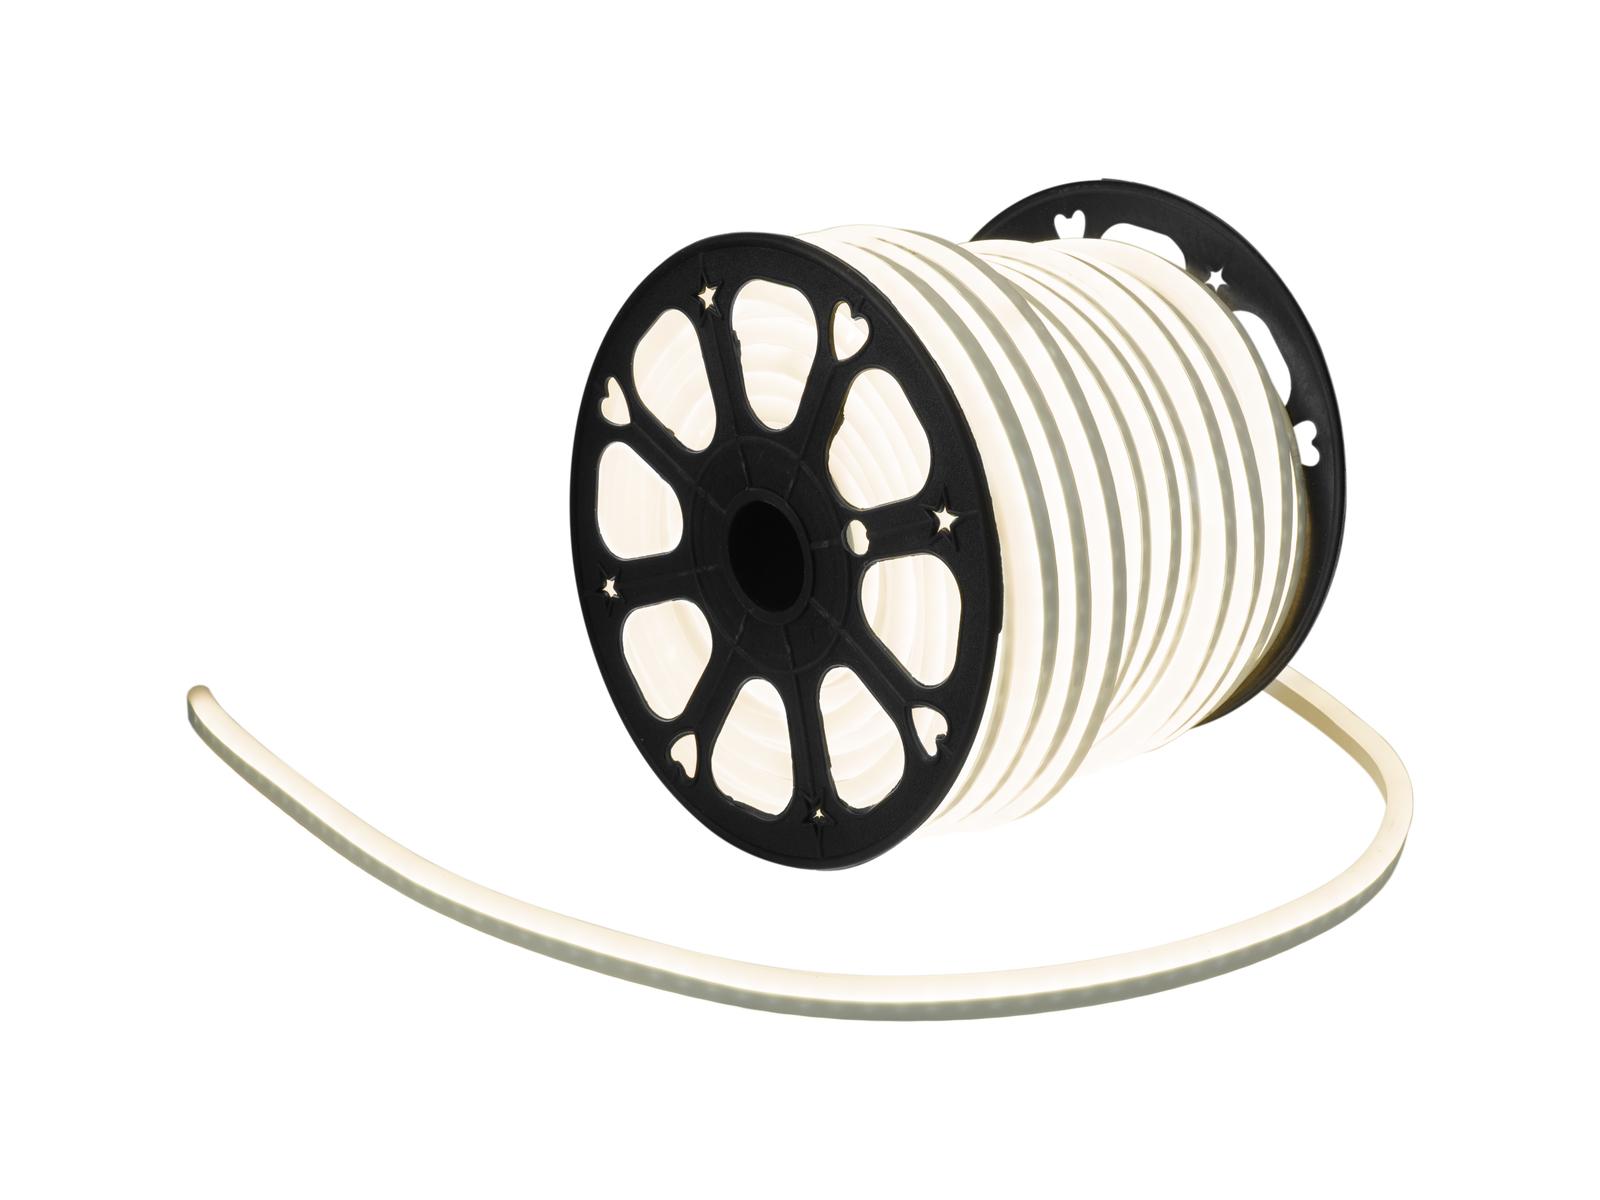 EUROLITE LED Neon Flex 230V Slim bianco caldo 100cm